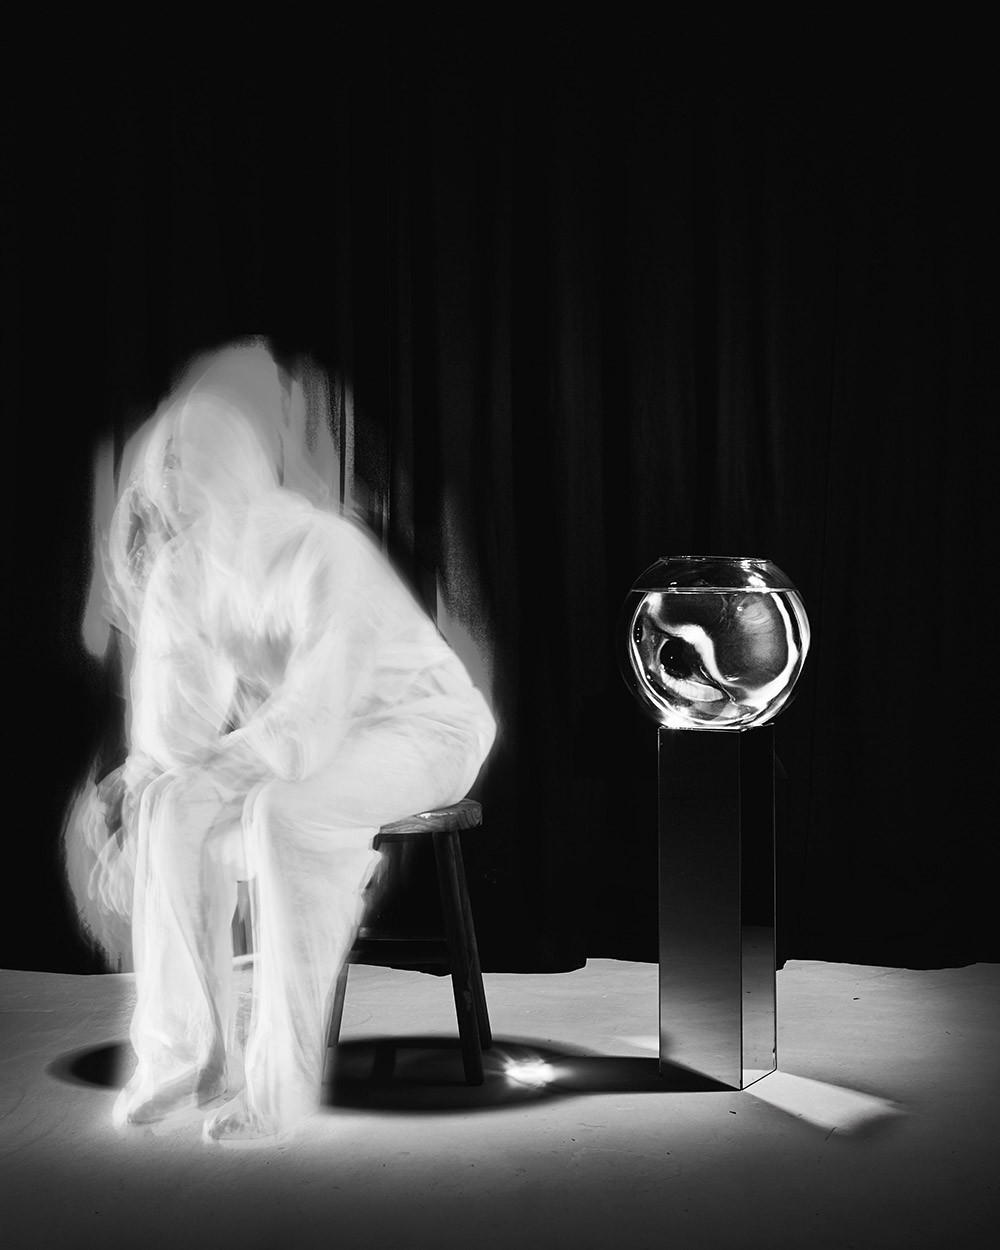 Kyu Sang Lee Ein kleines Nachtfoto No.2 2018 Hahnehmuhle Baryta 12 x 15 cm